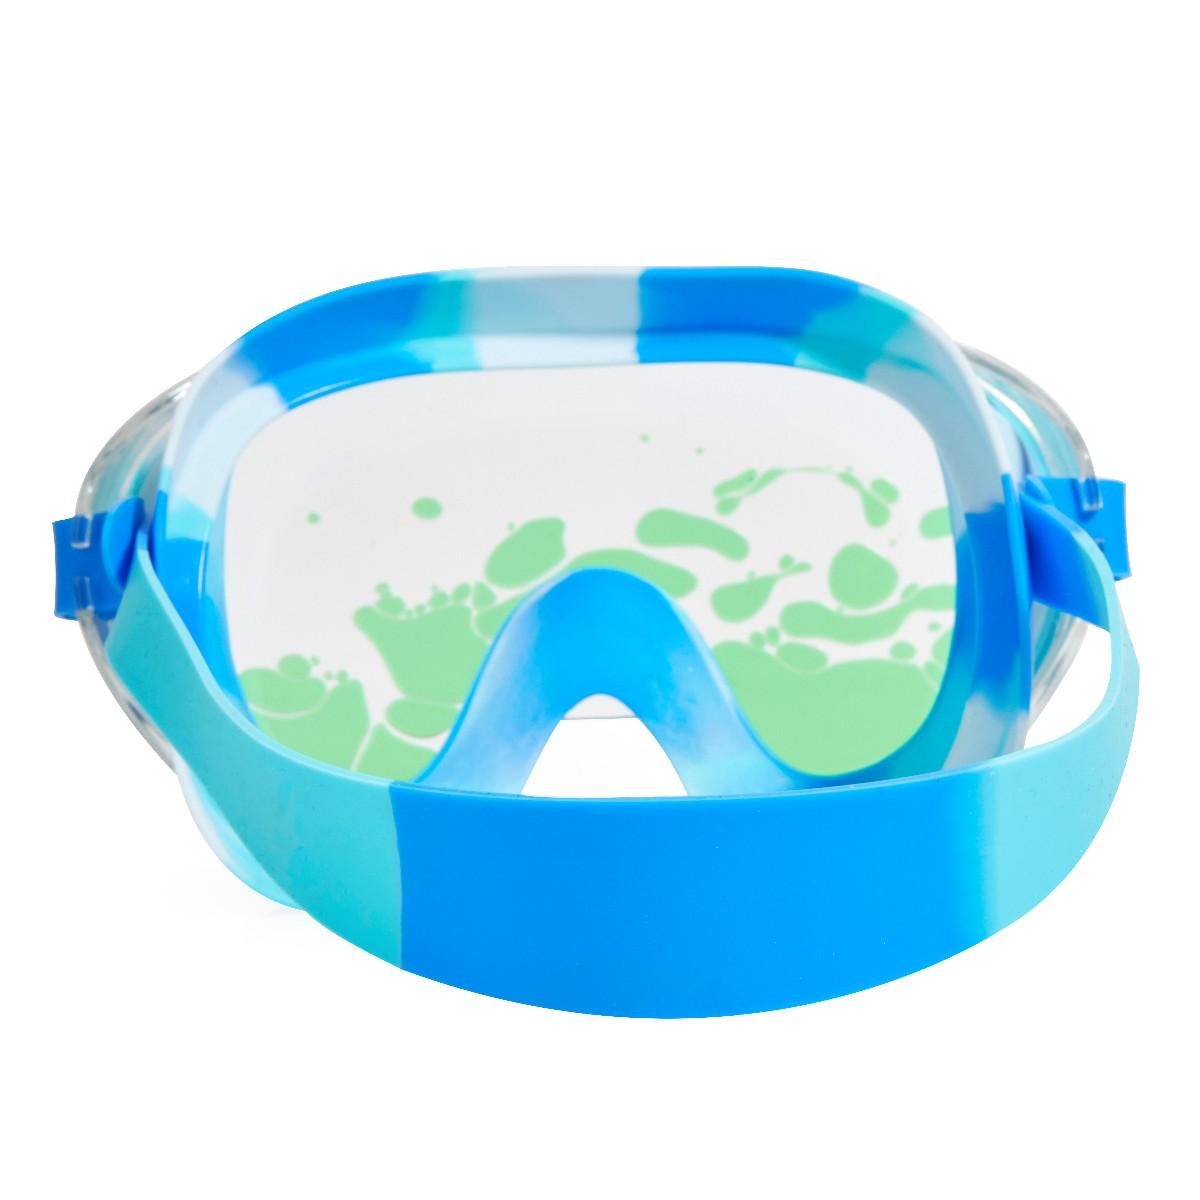 Svømmemaske - Lava Blå